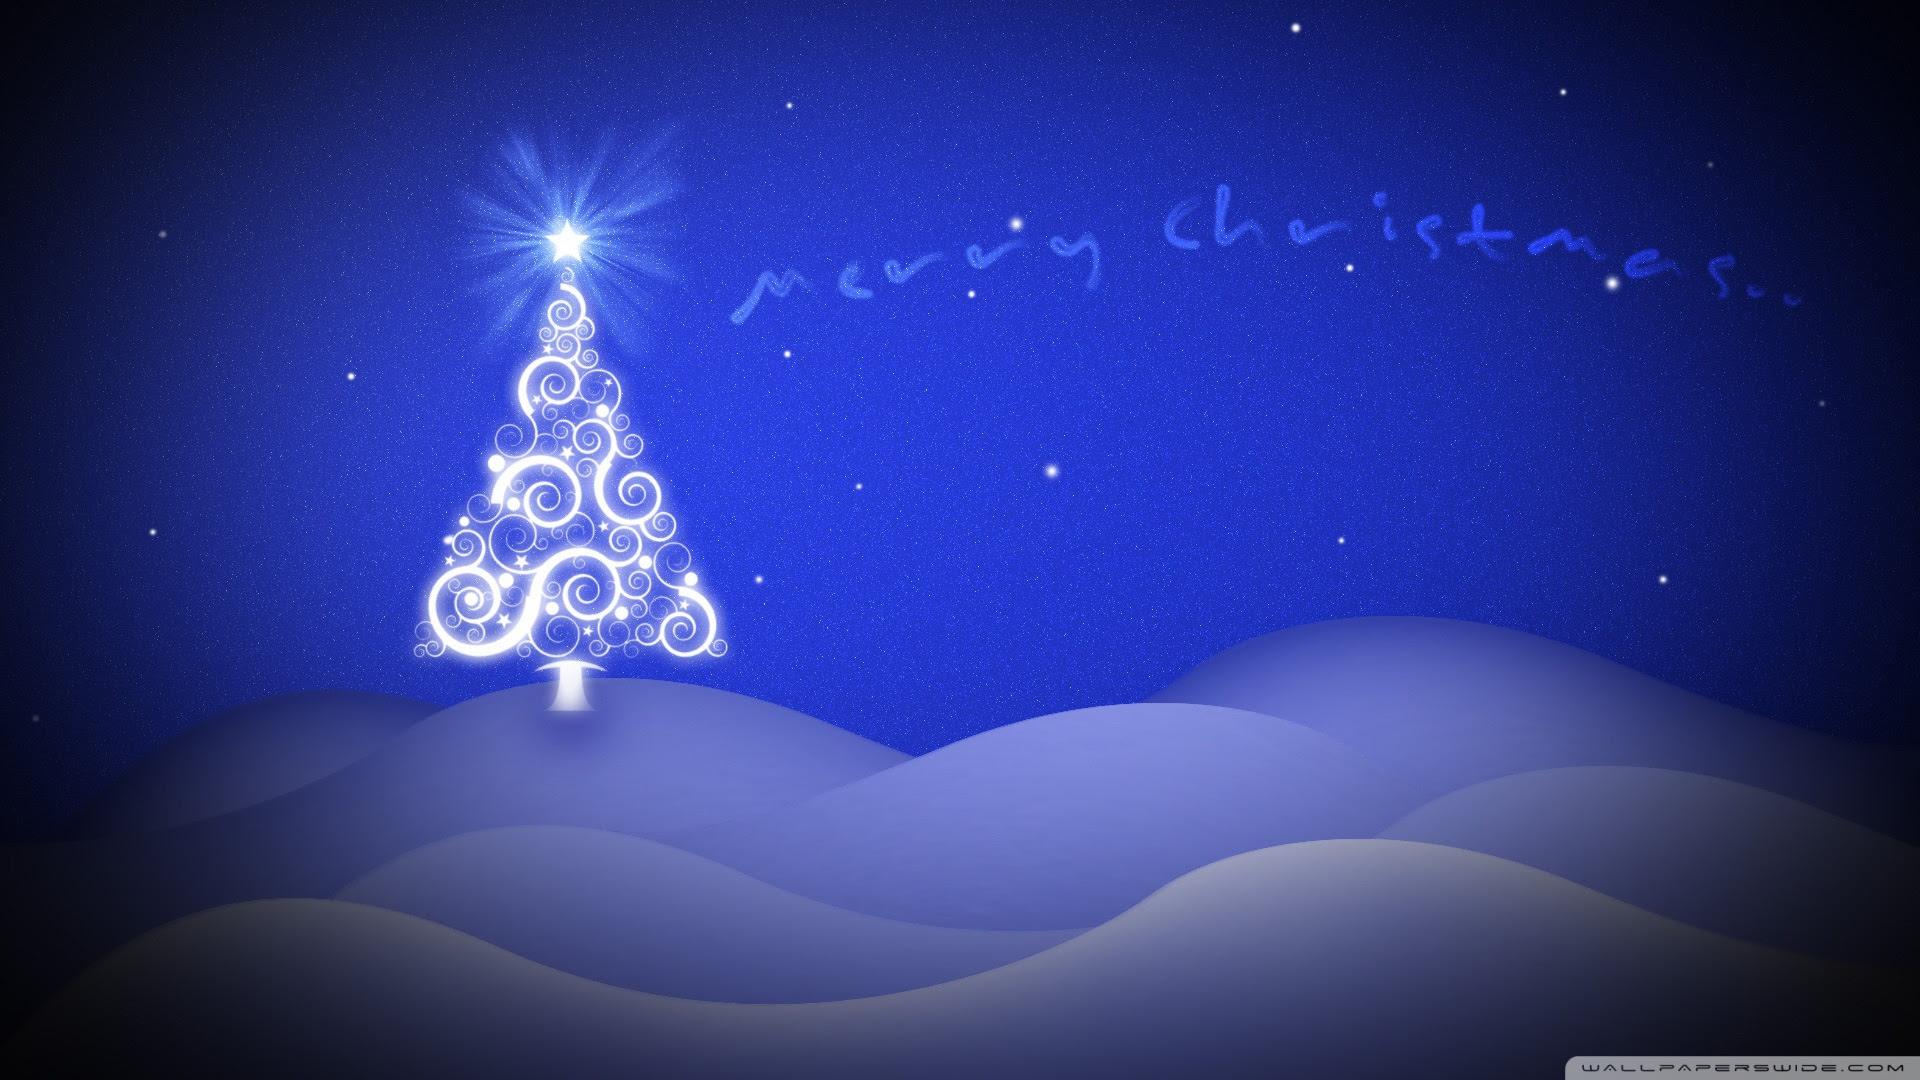 Merry Christmas Ultra HD Desktop Background Wallpaper For 4K